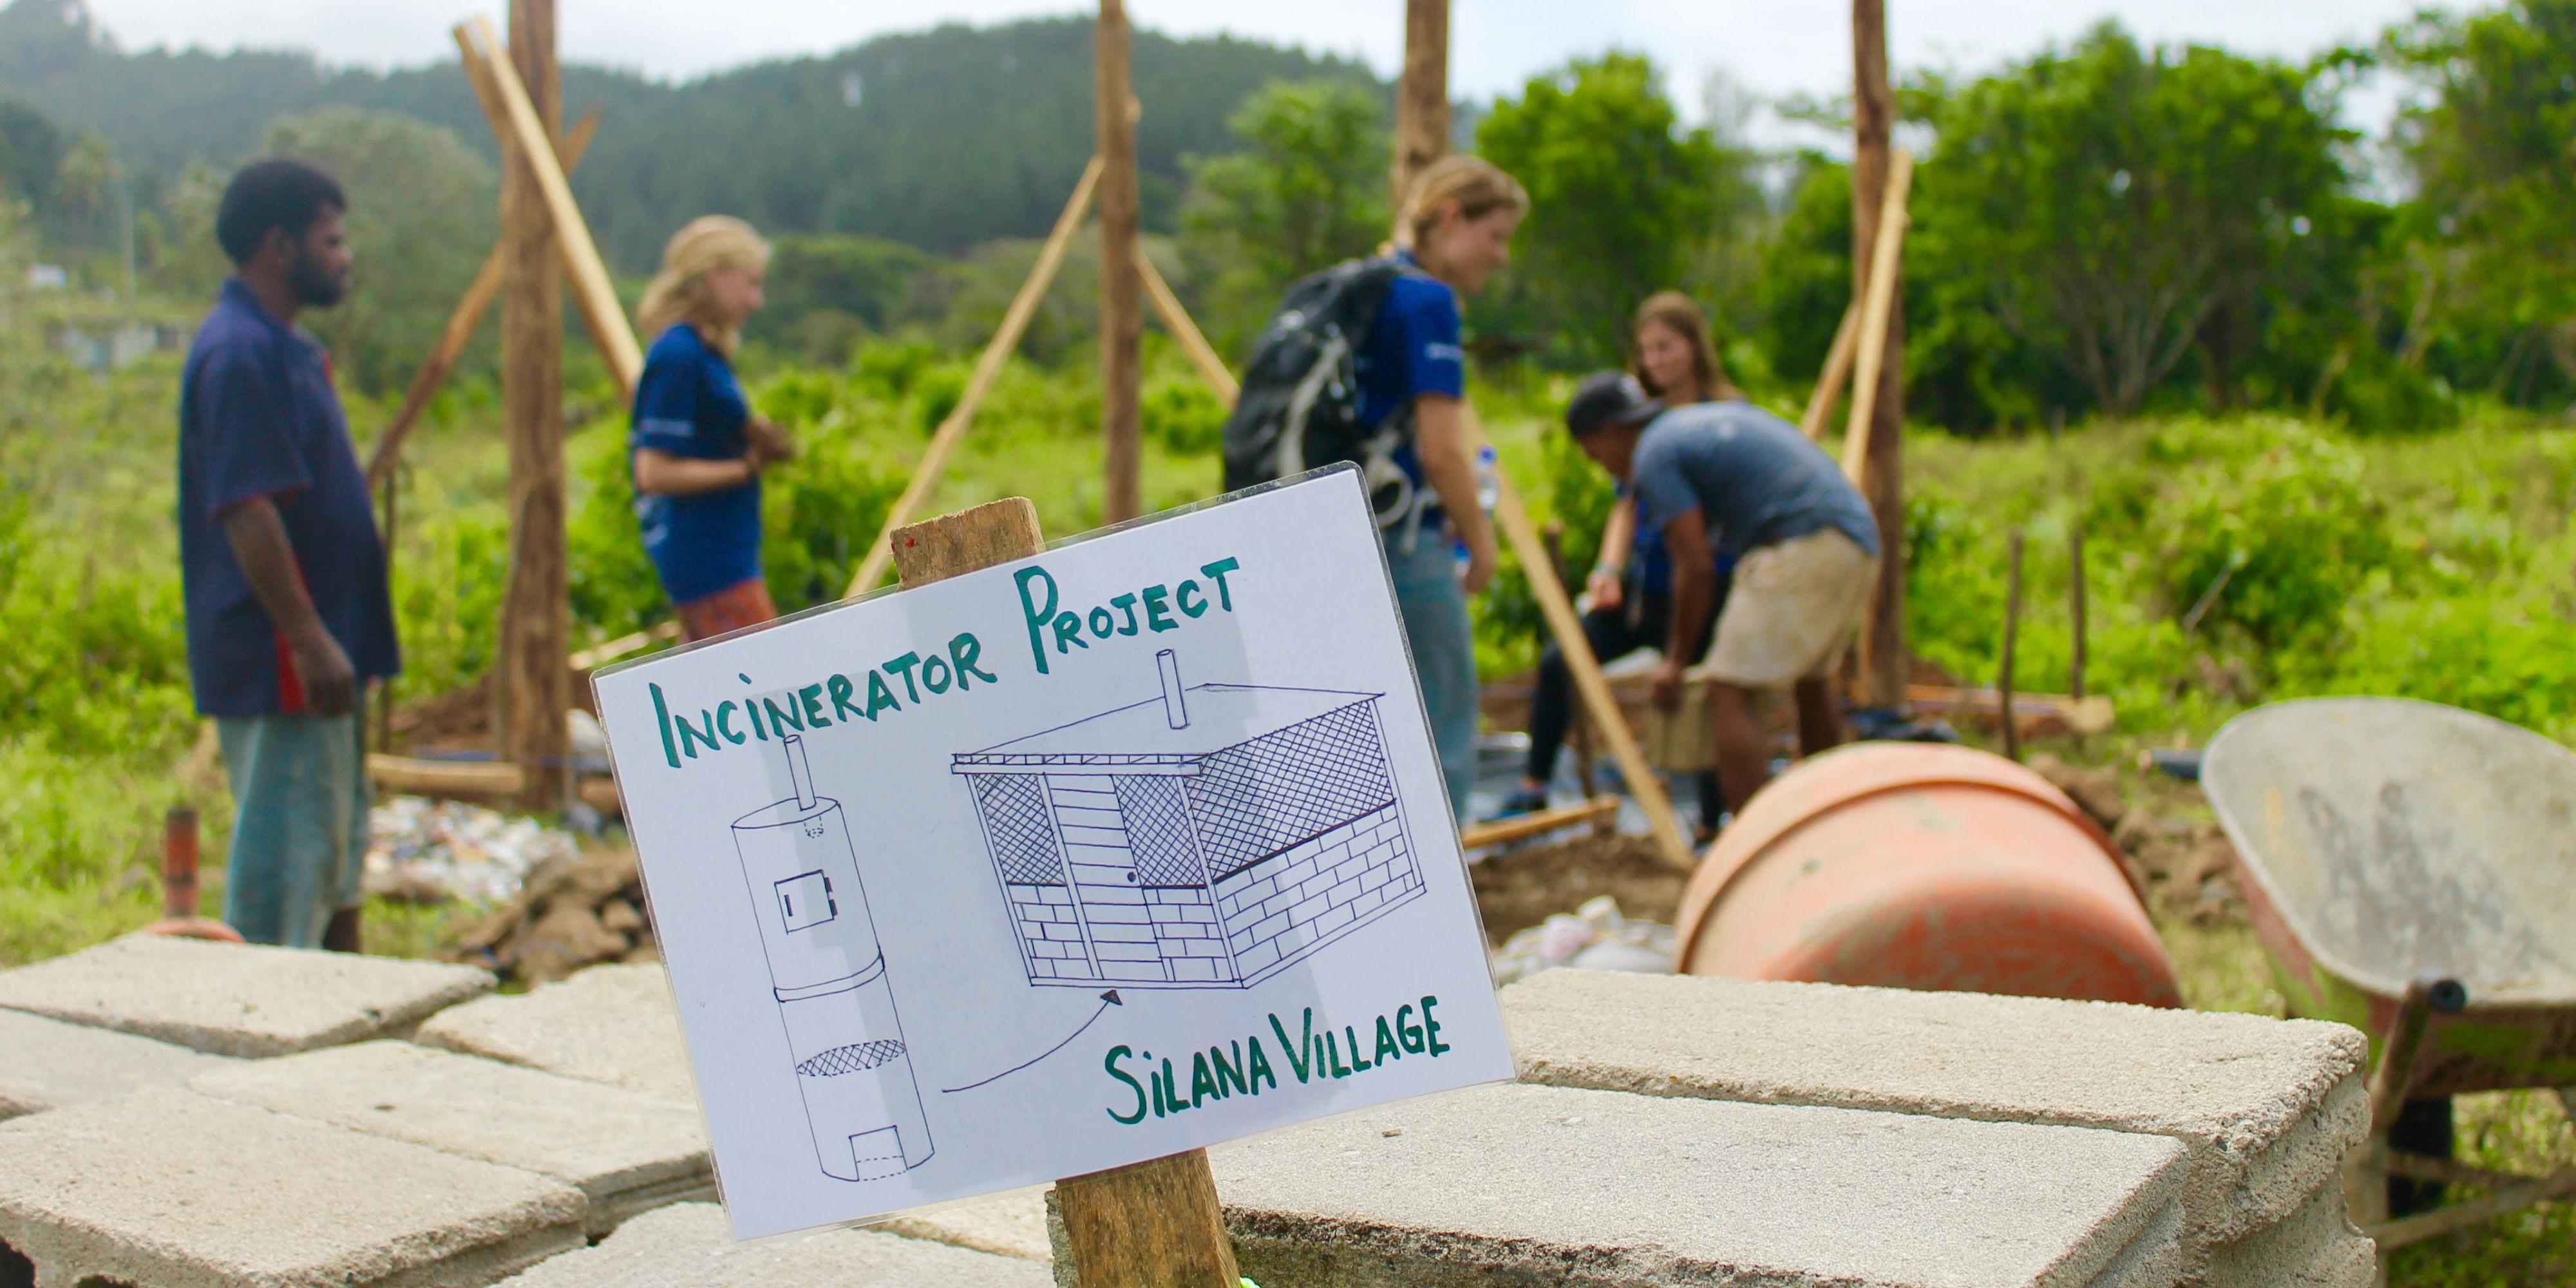 volunteers doing sustainable volunteering